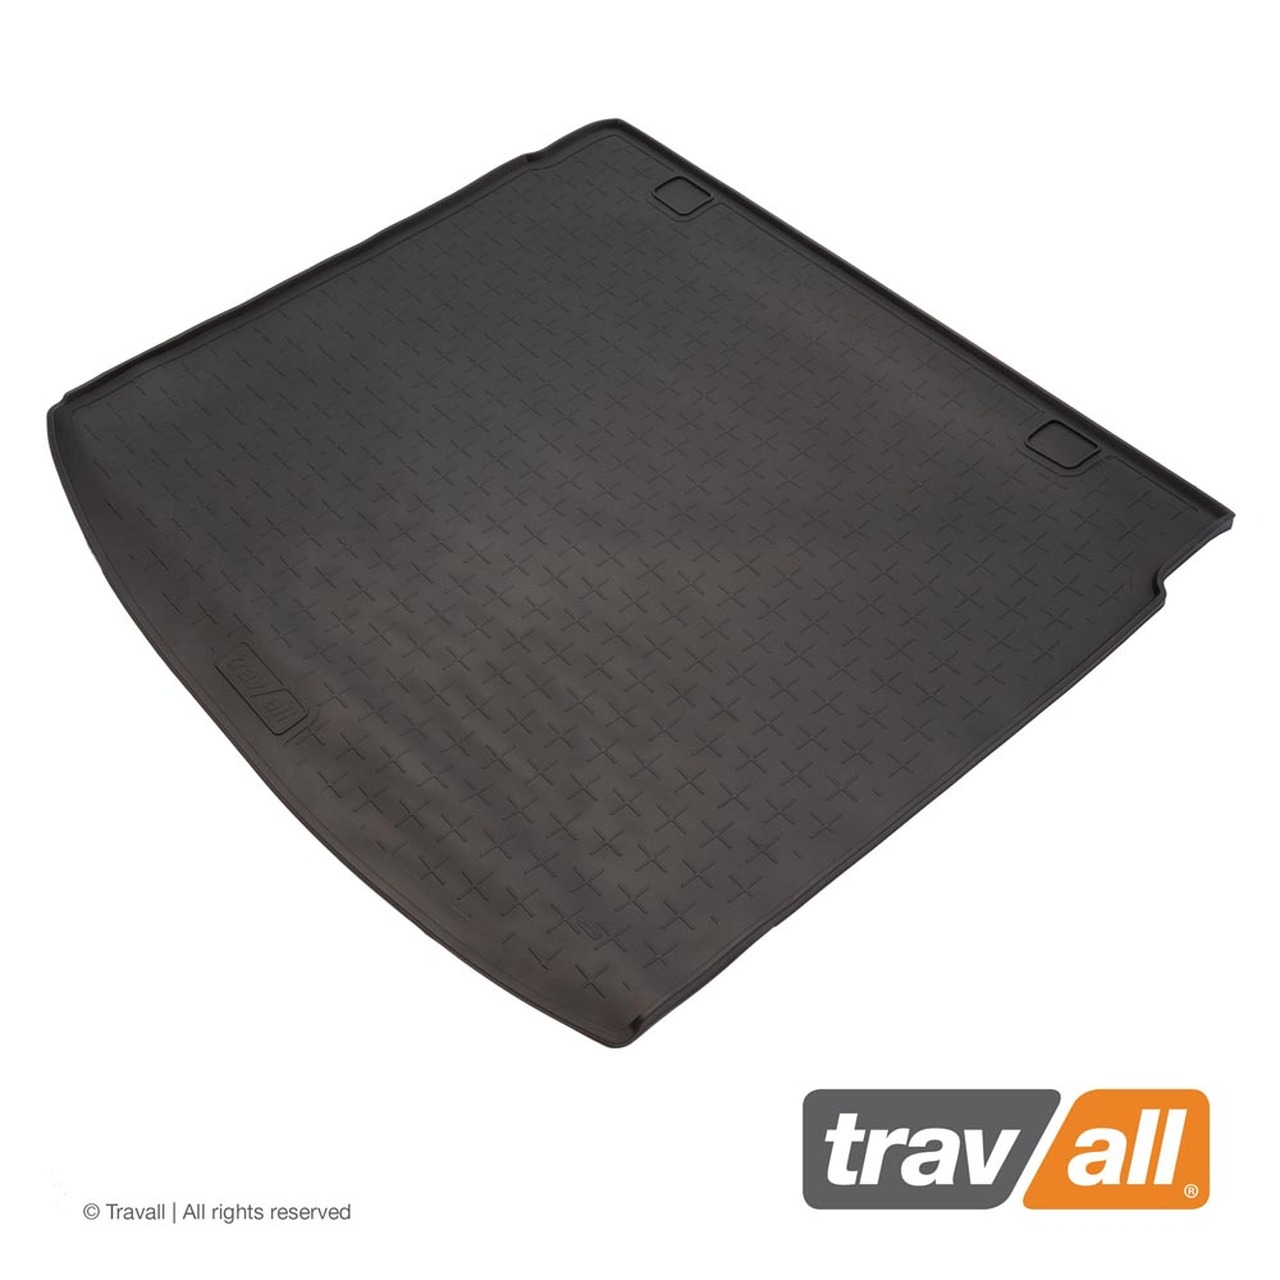 TBM1185 Travall Boot Mat for Honda CRV 2017 onwards